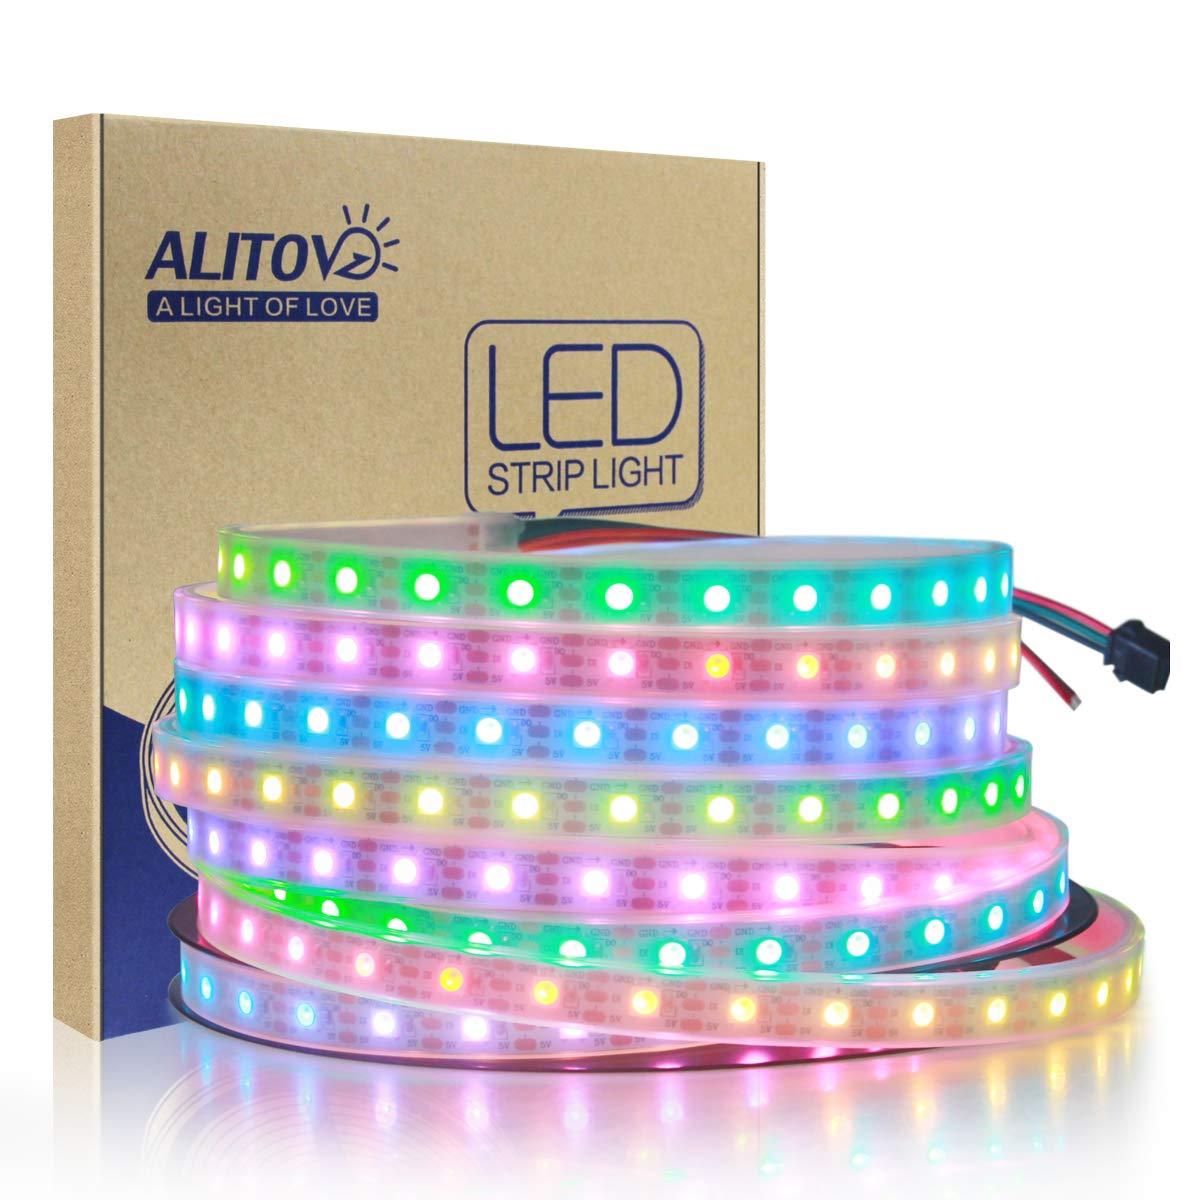 ALITOVE 16 4ft 300 LEDs WS2812B Individually Addressable 5050 RGB LED Strip  Light LED Pixel Flexible Lamp Tube Waterproof IP67 White PCB